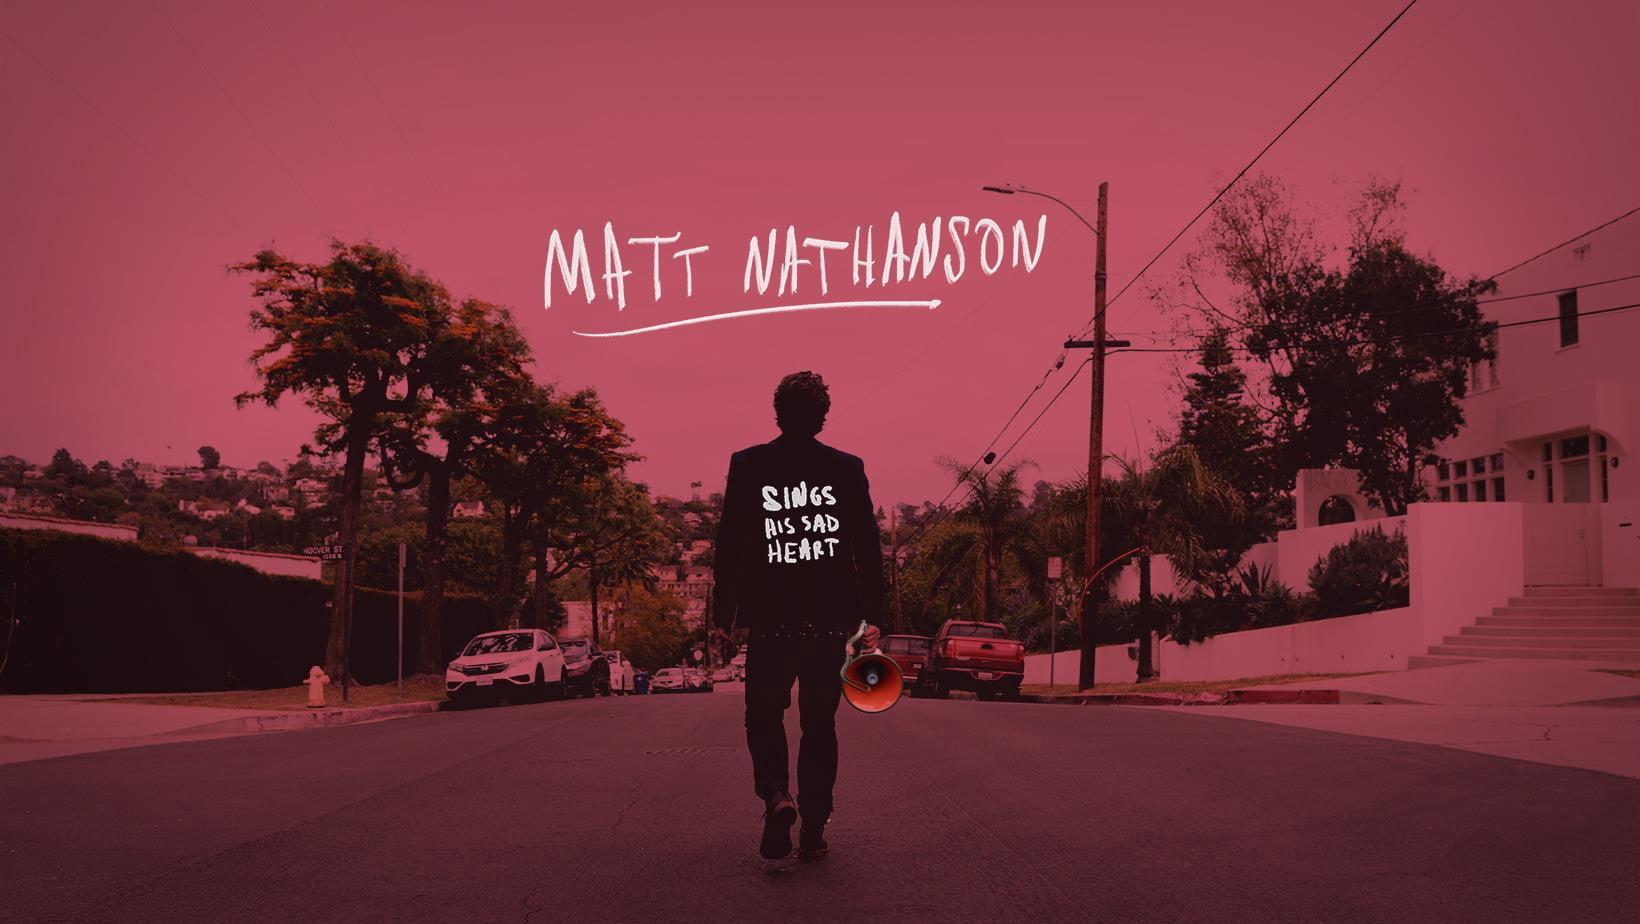 Matt Nathanson: Writing From the Heart